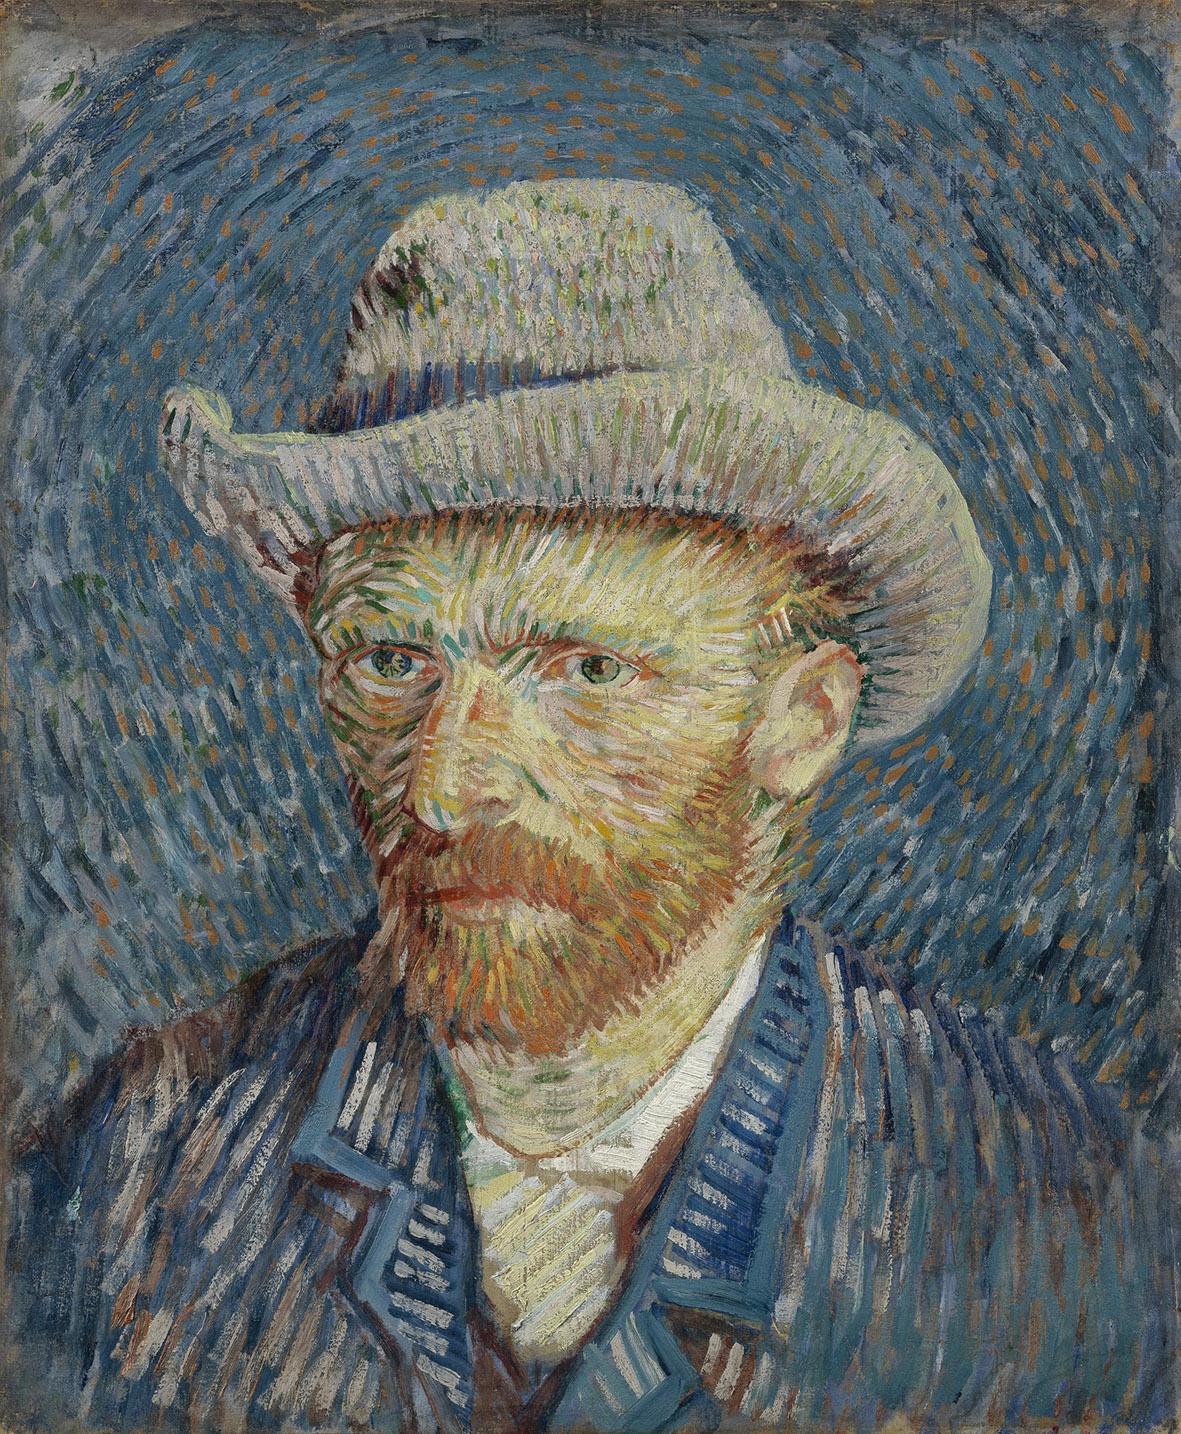 Vincent van Gogh, Autoritratto con cappello di feltro grigio, 1887, olio su tela, cm 44.5X37.2